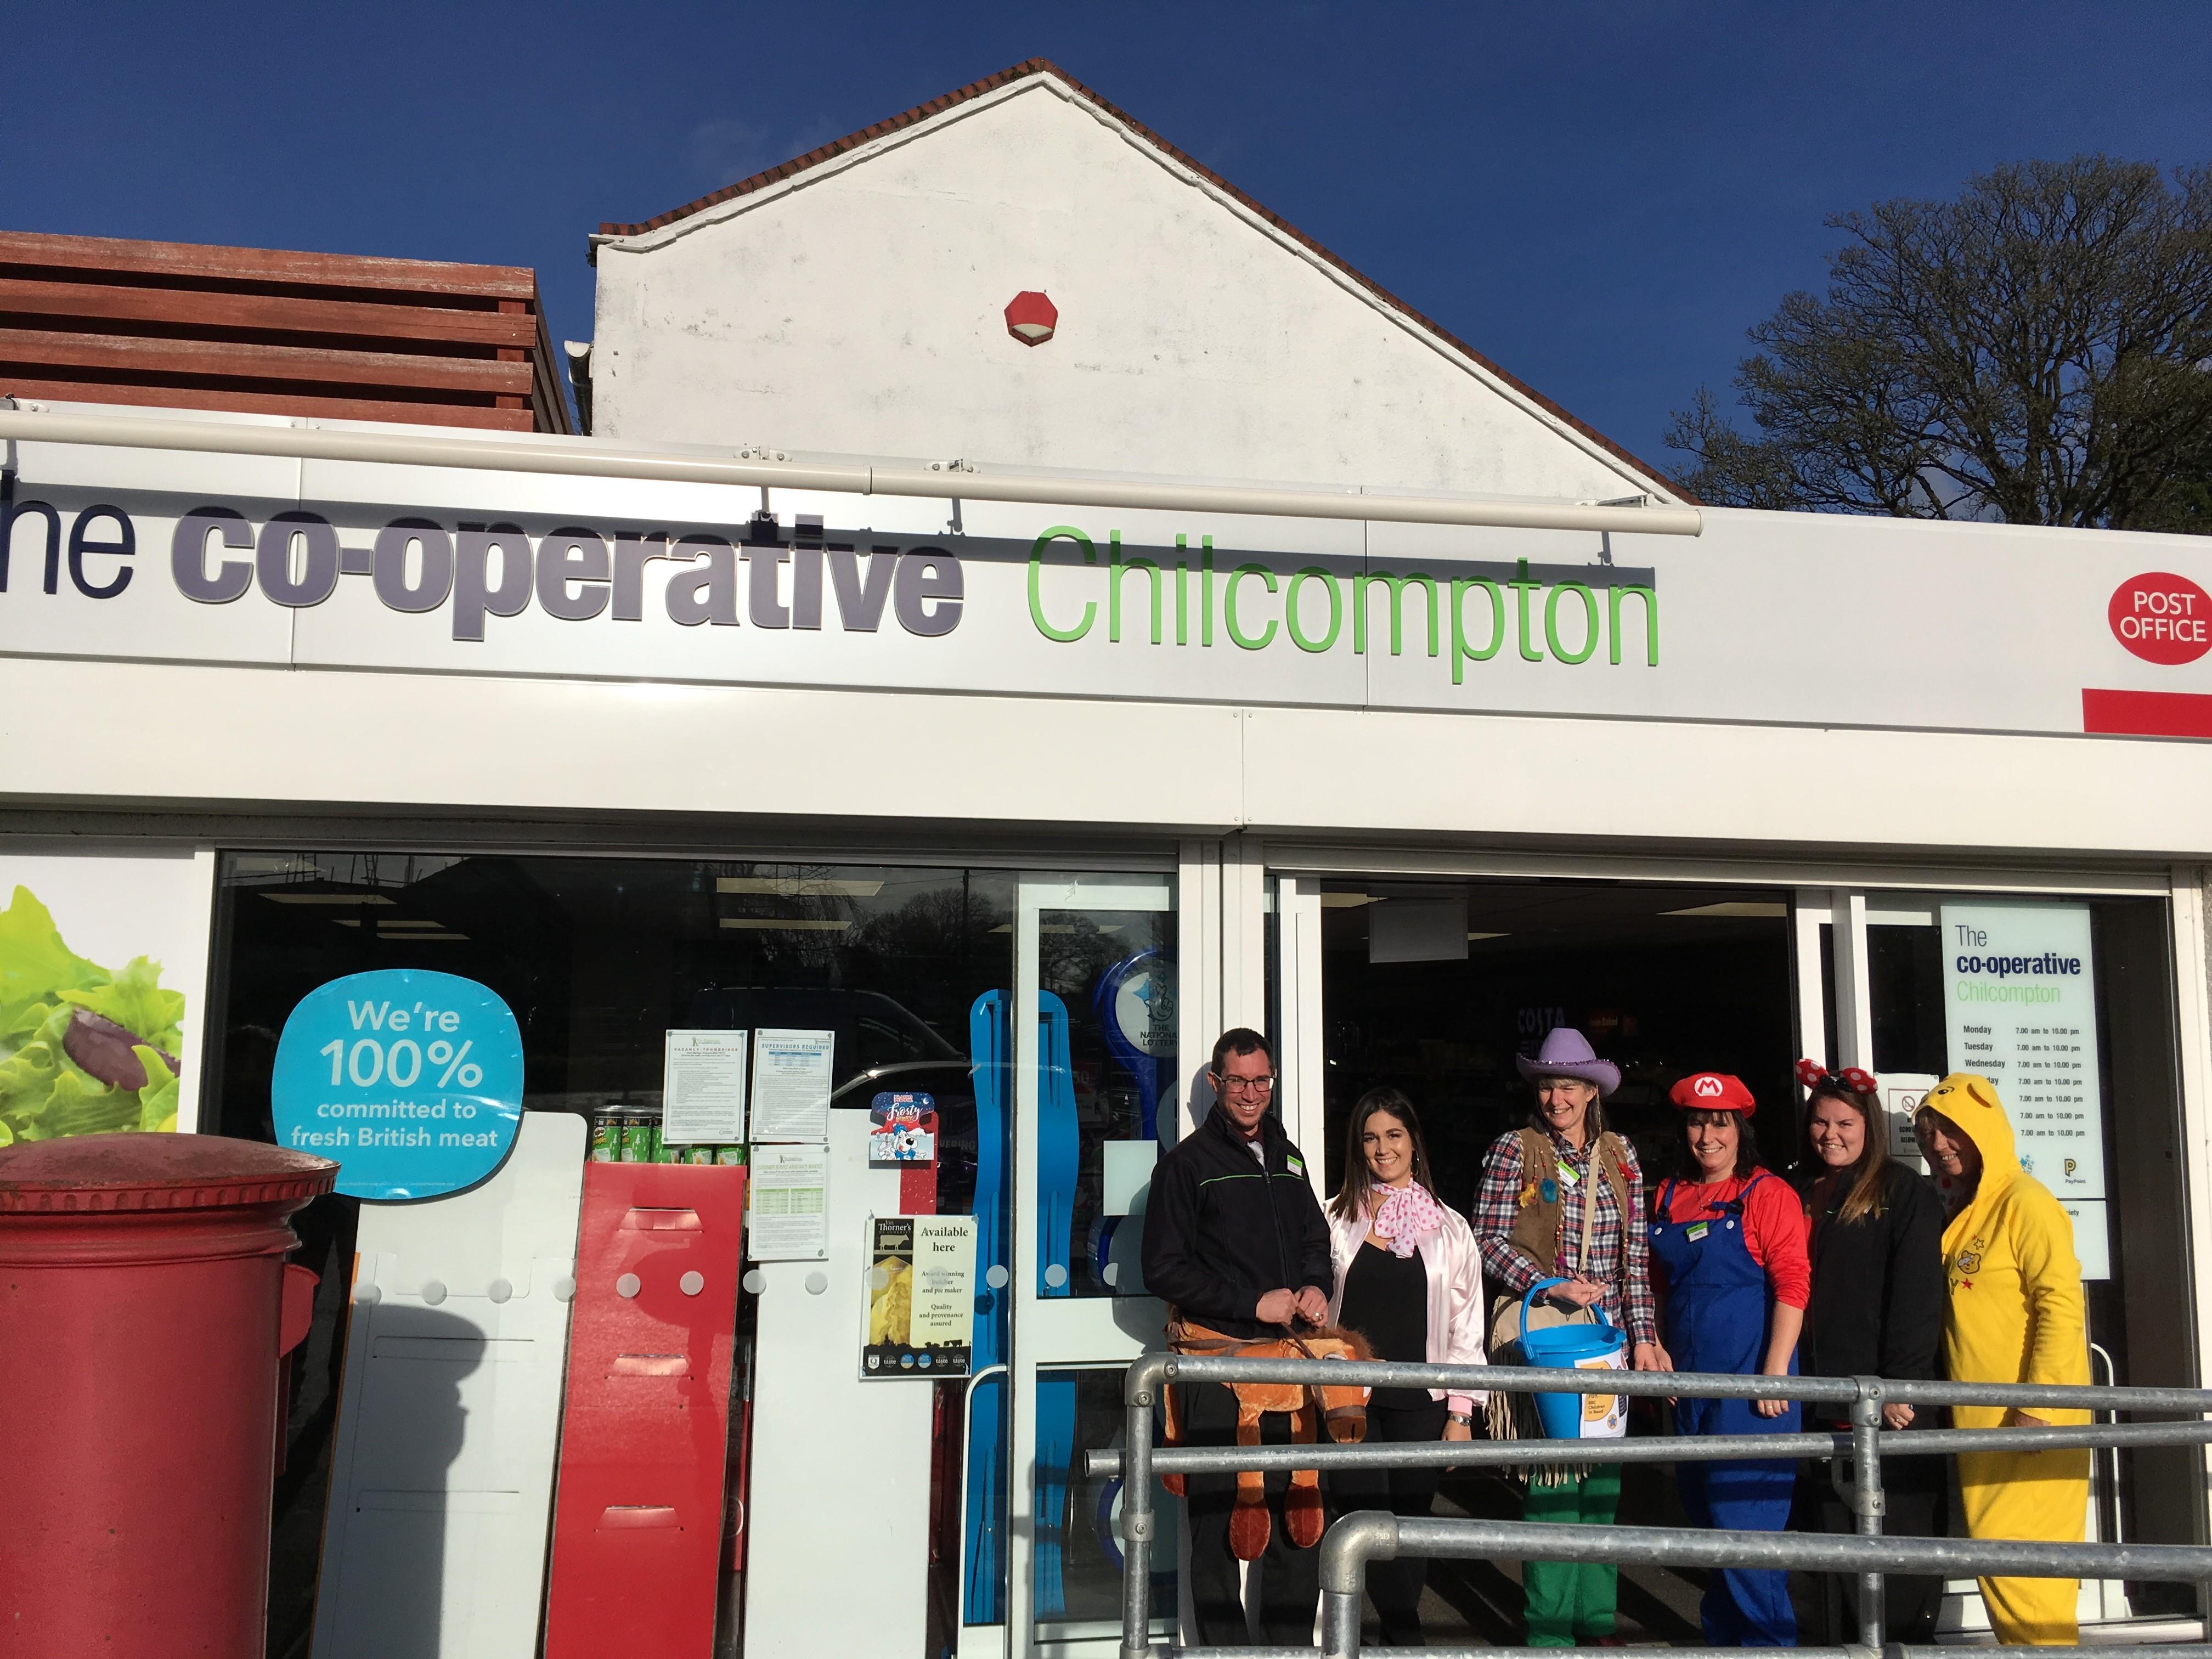 Chilcompton team